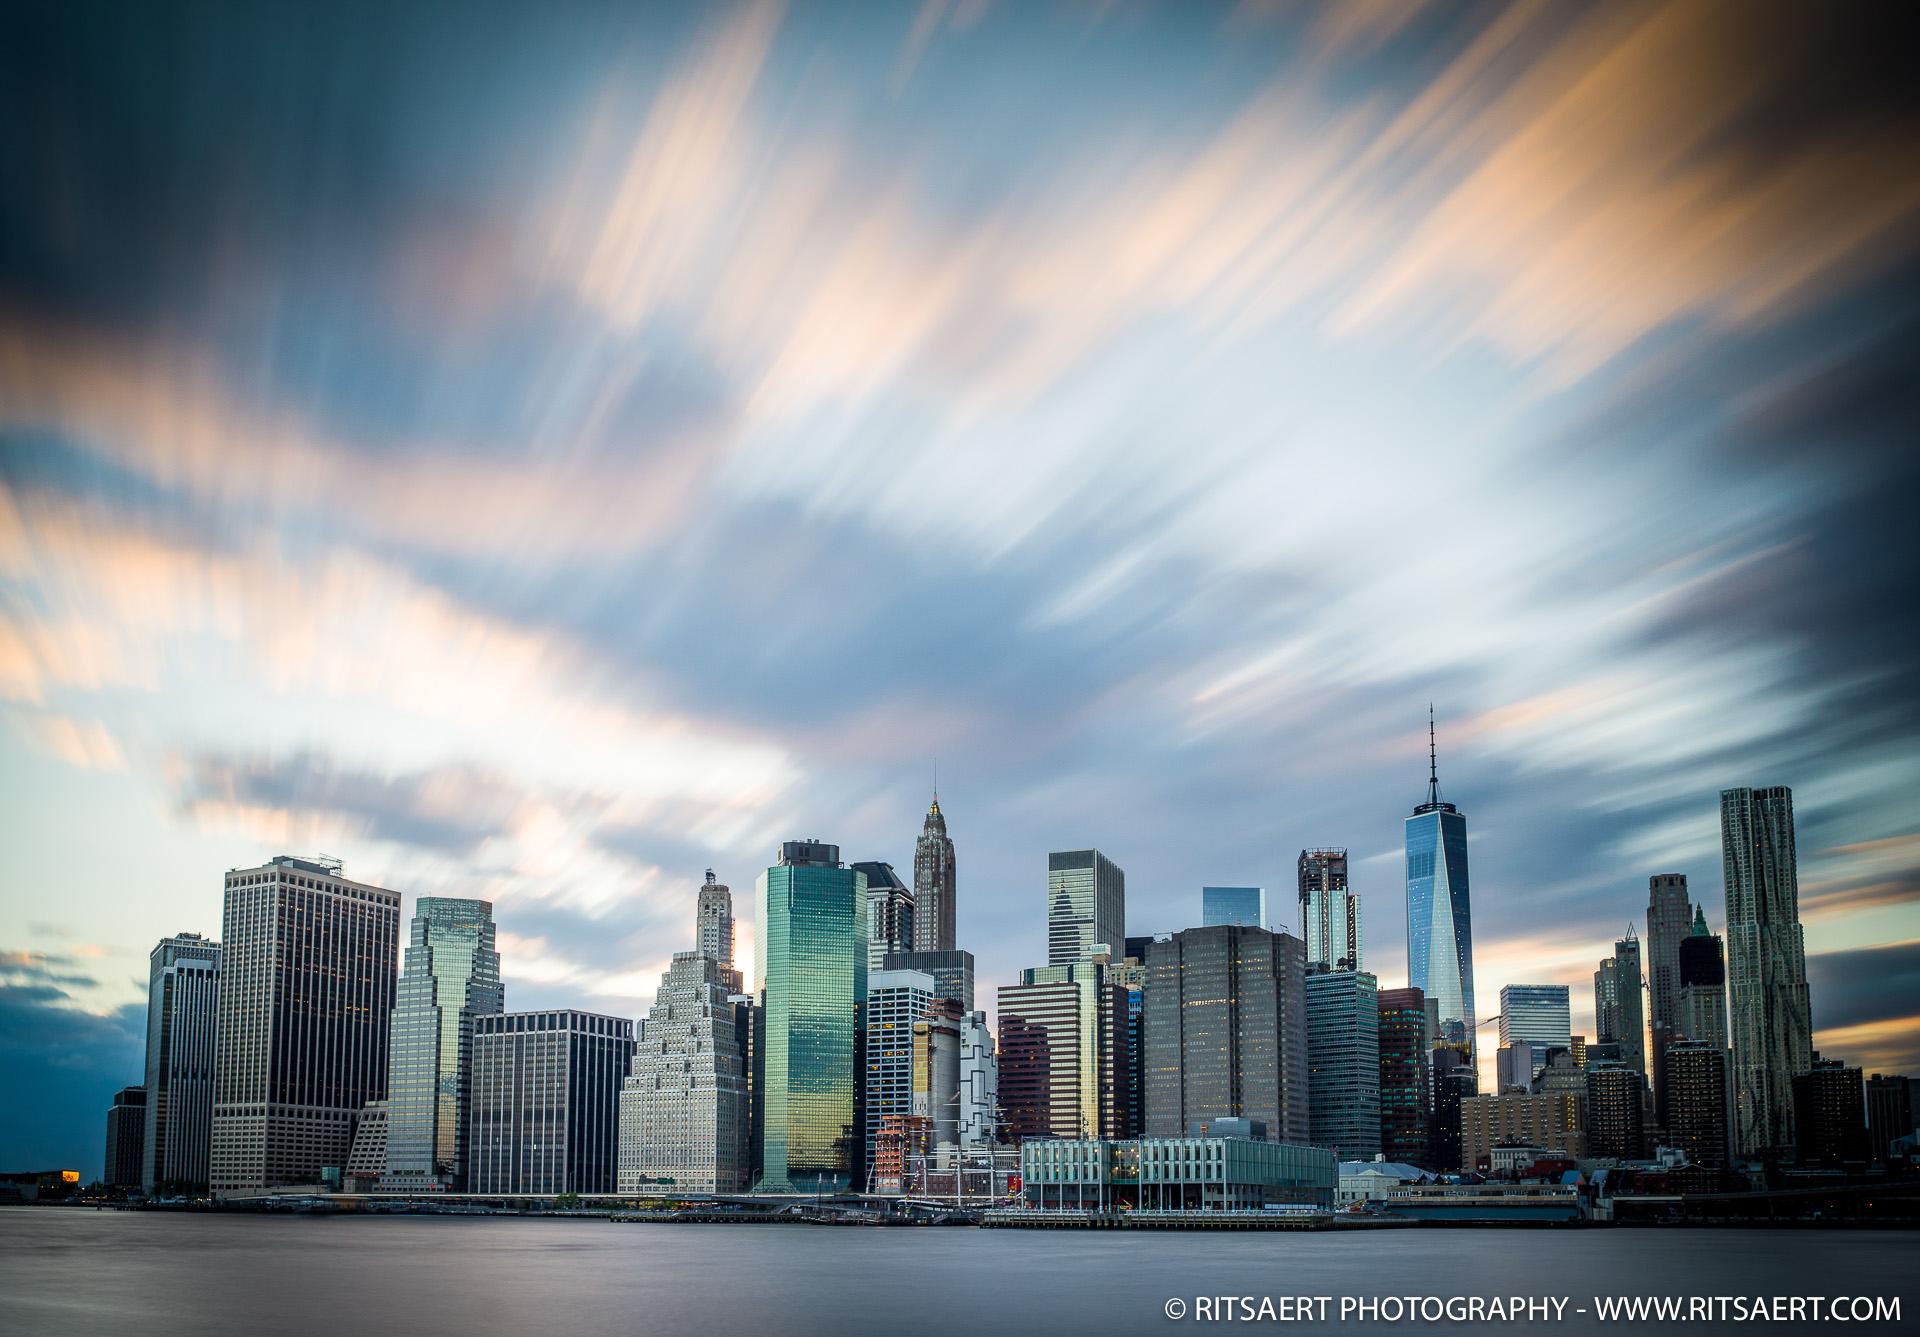 Sunset Manhatten - New York - USA